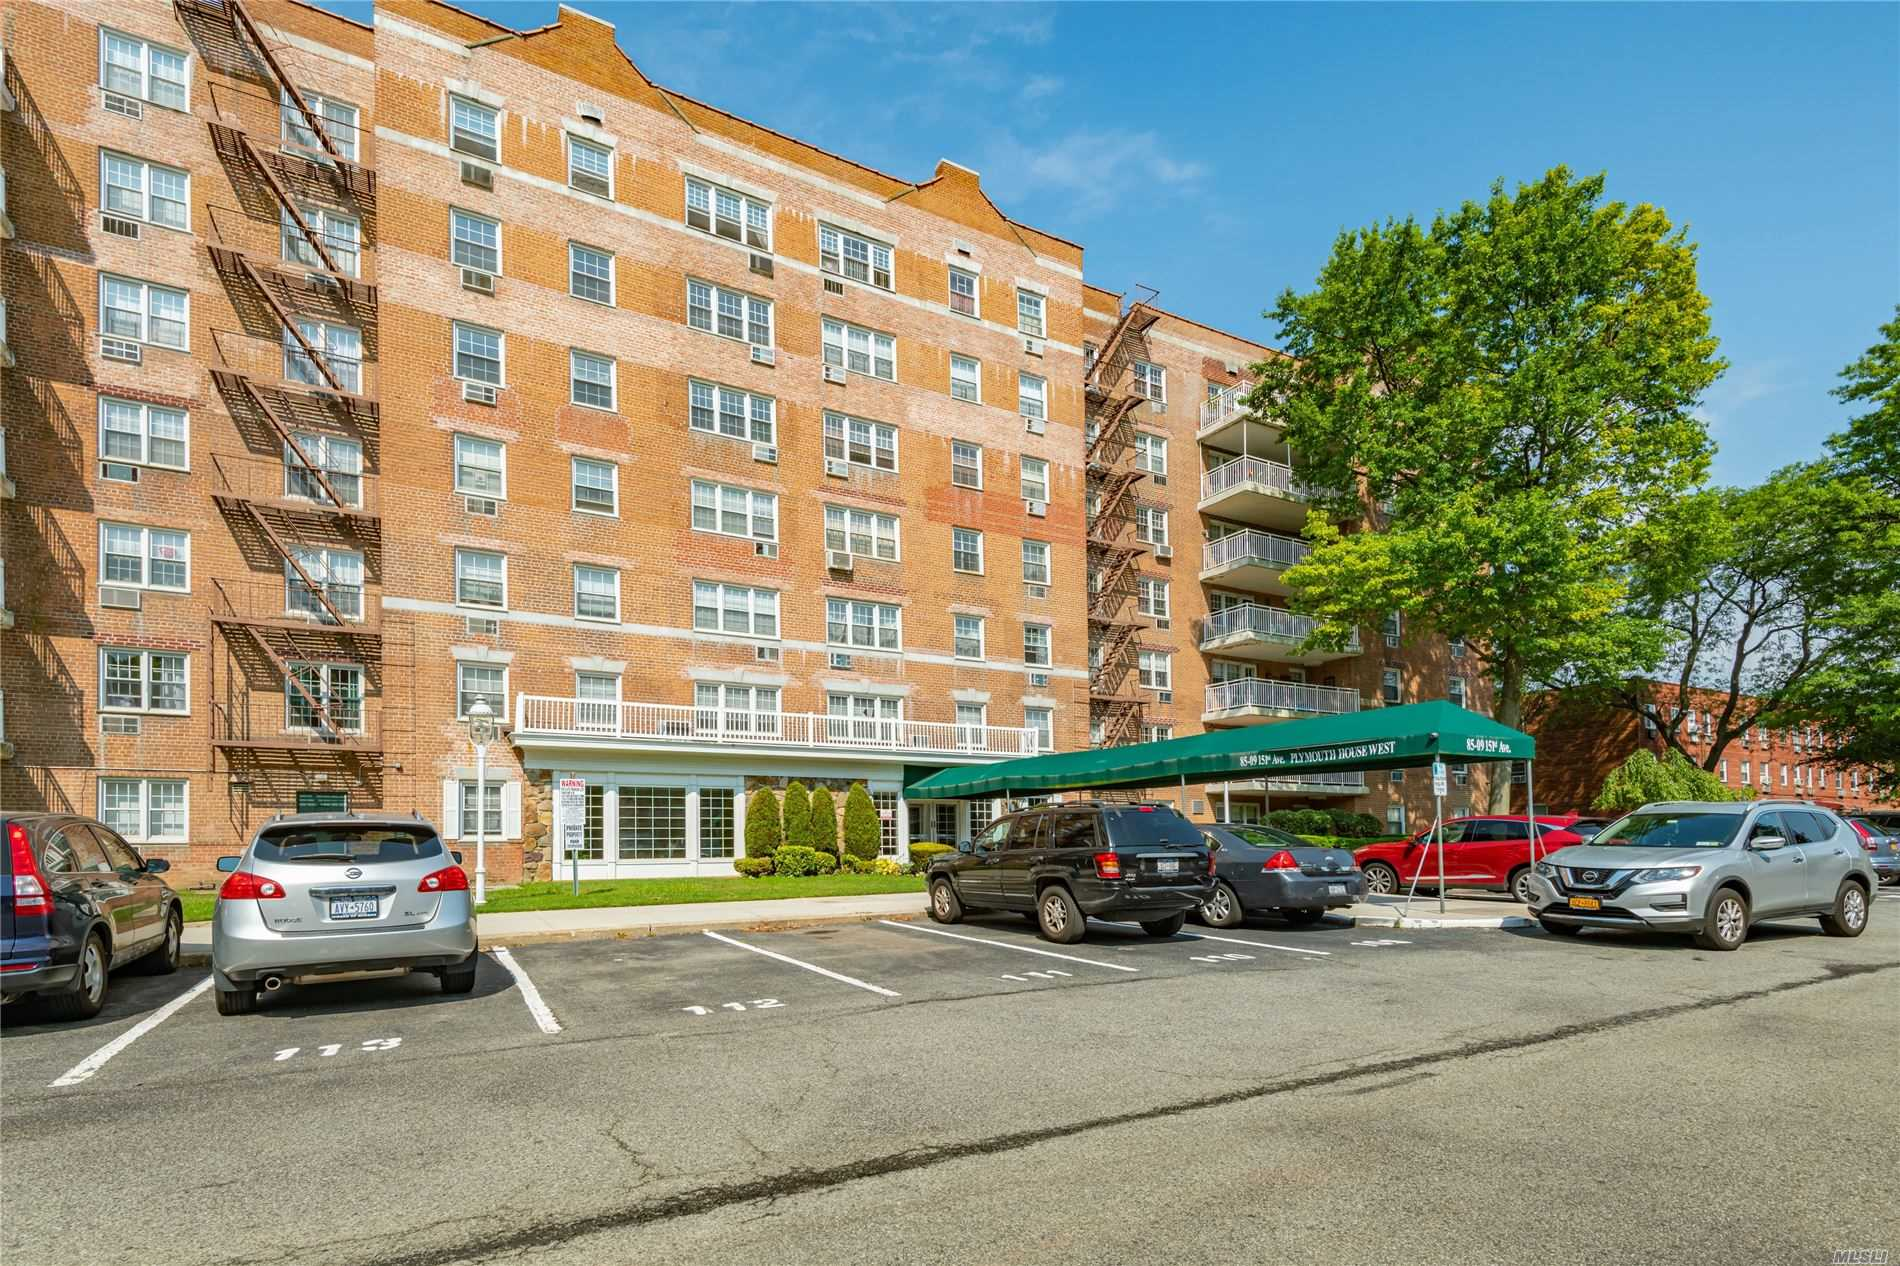 Property for sale at 85-09 151st Avenue # 5L, Howard Beach NY 11414, Howard Beach,  New York 11414